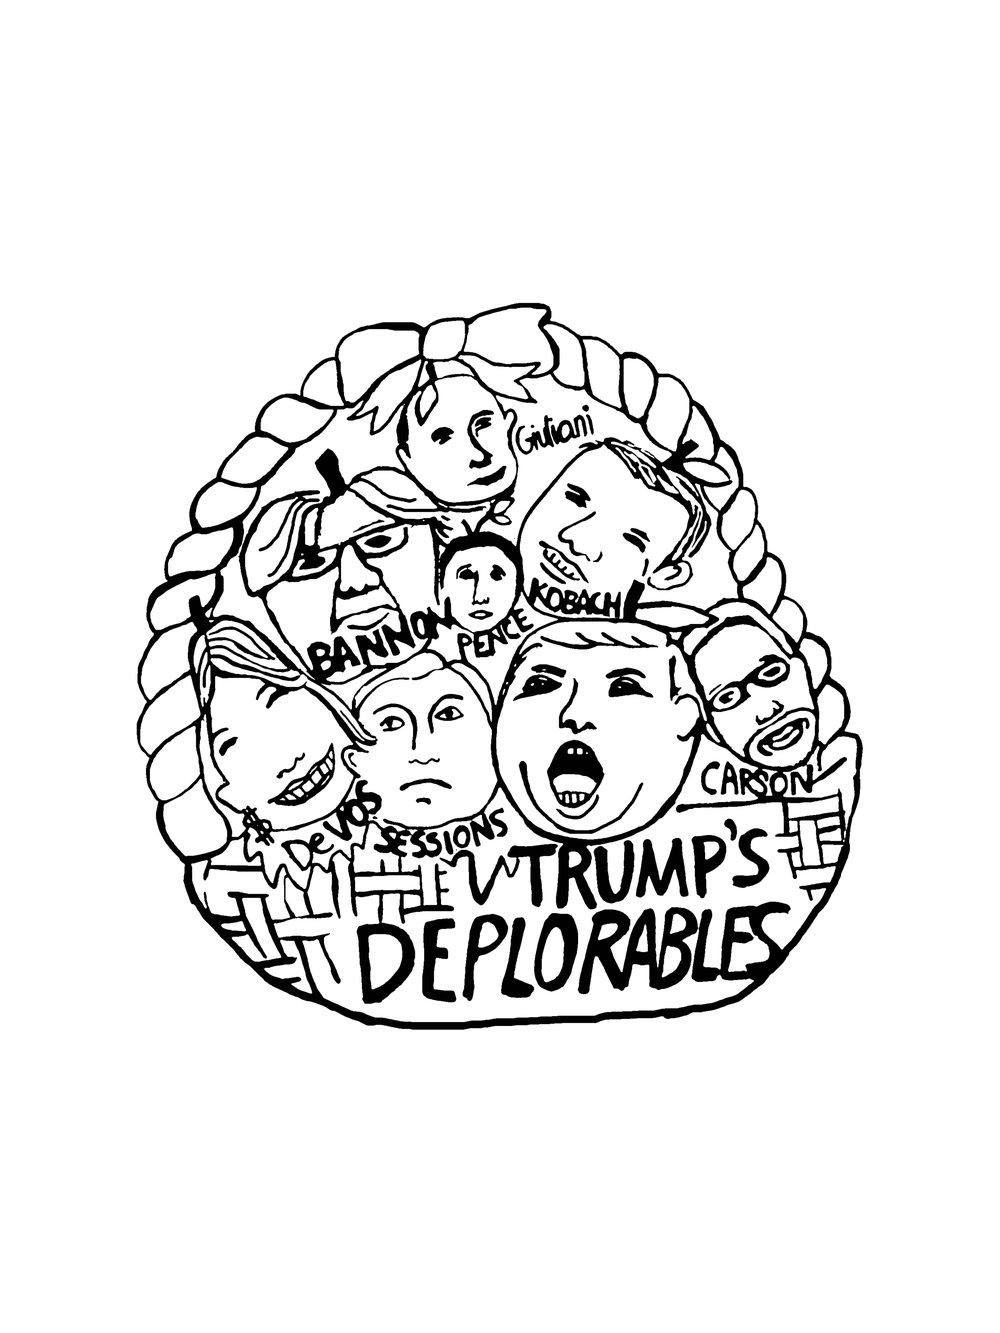 deplorablebw.jpg